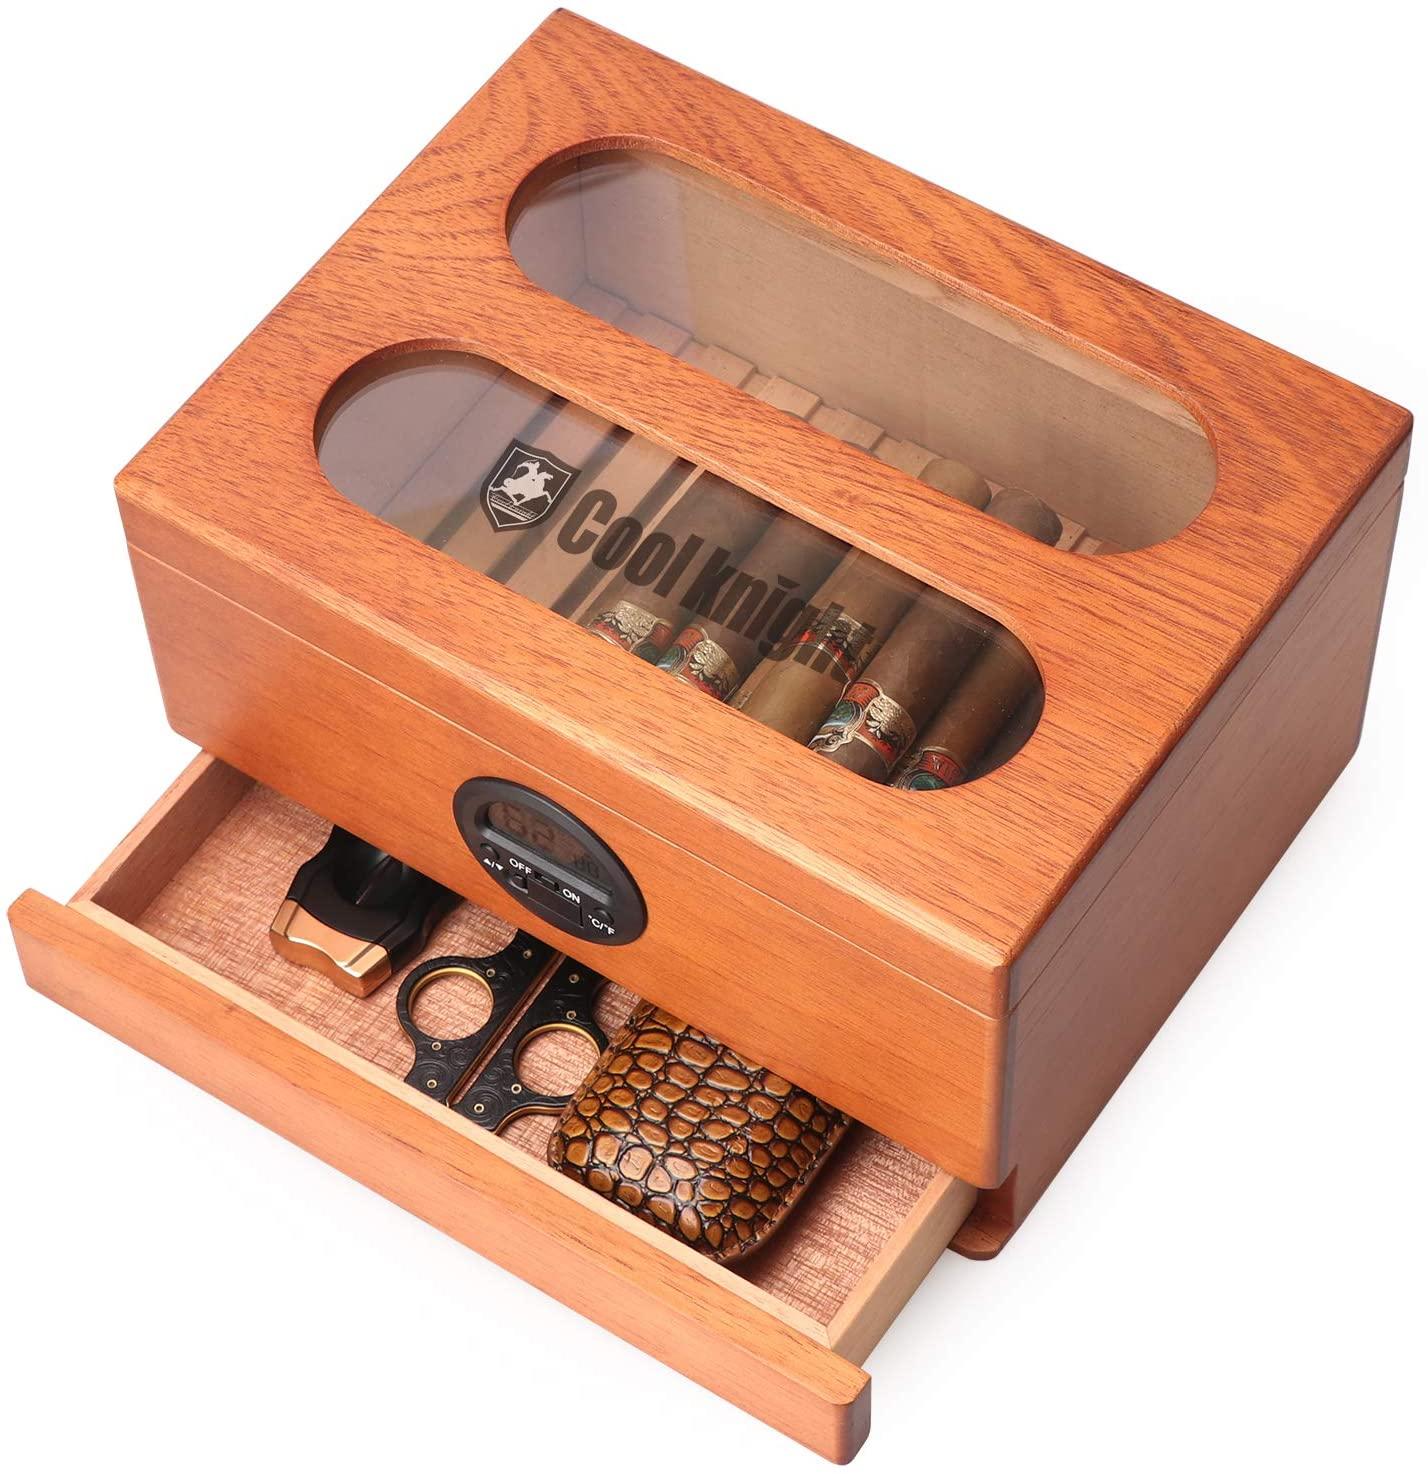 COOL KNIGHT Cigar Humidor